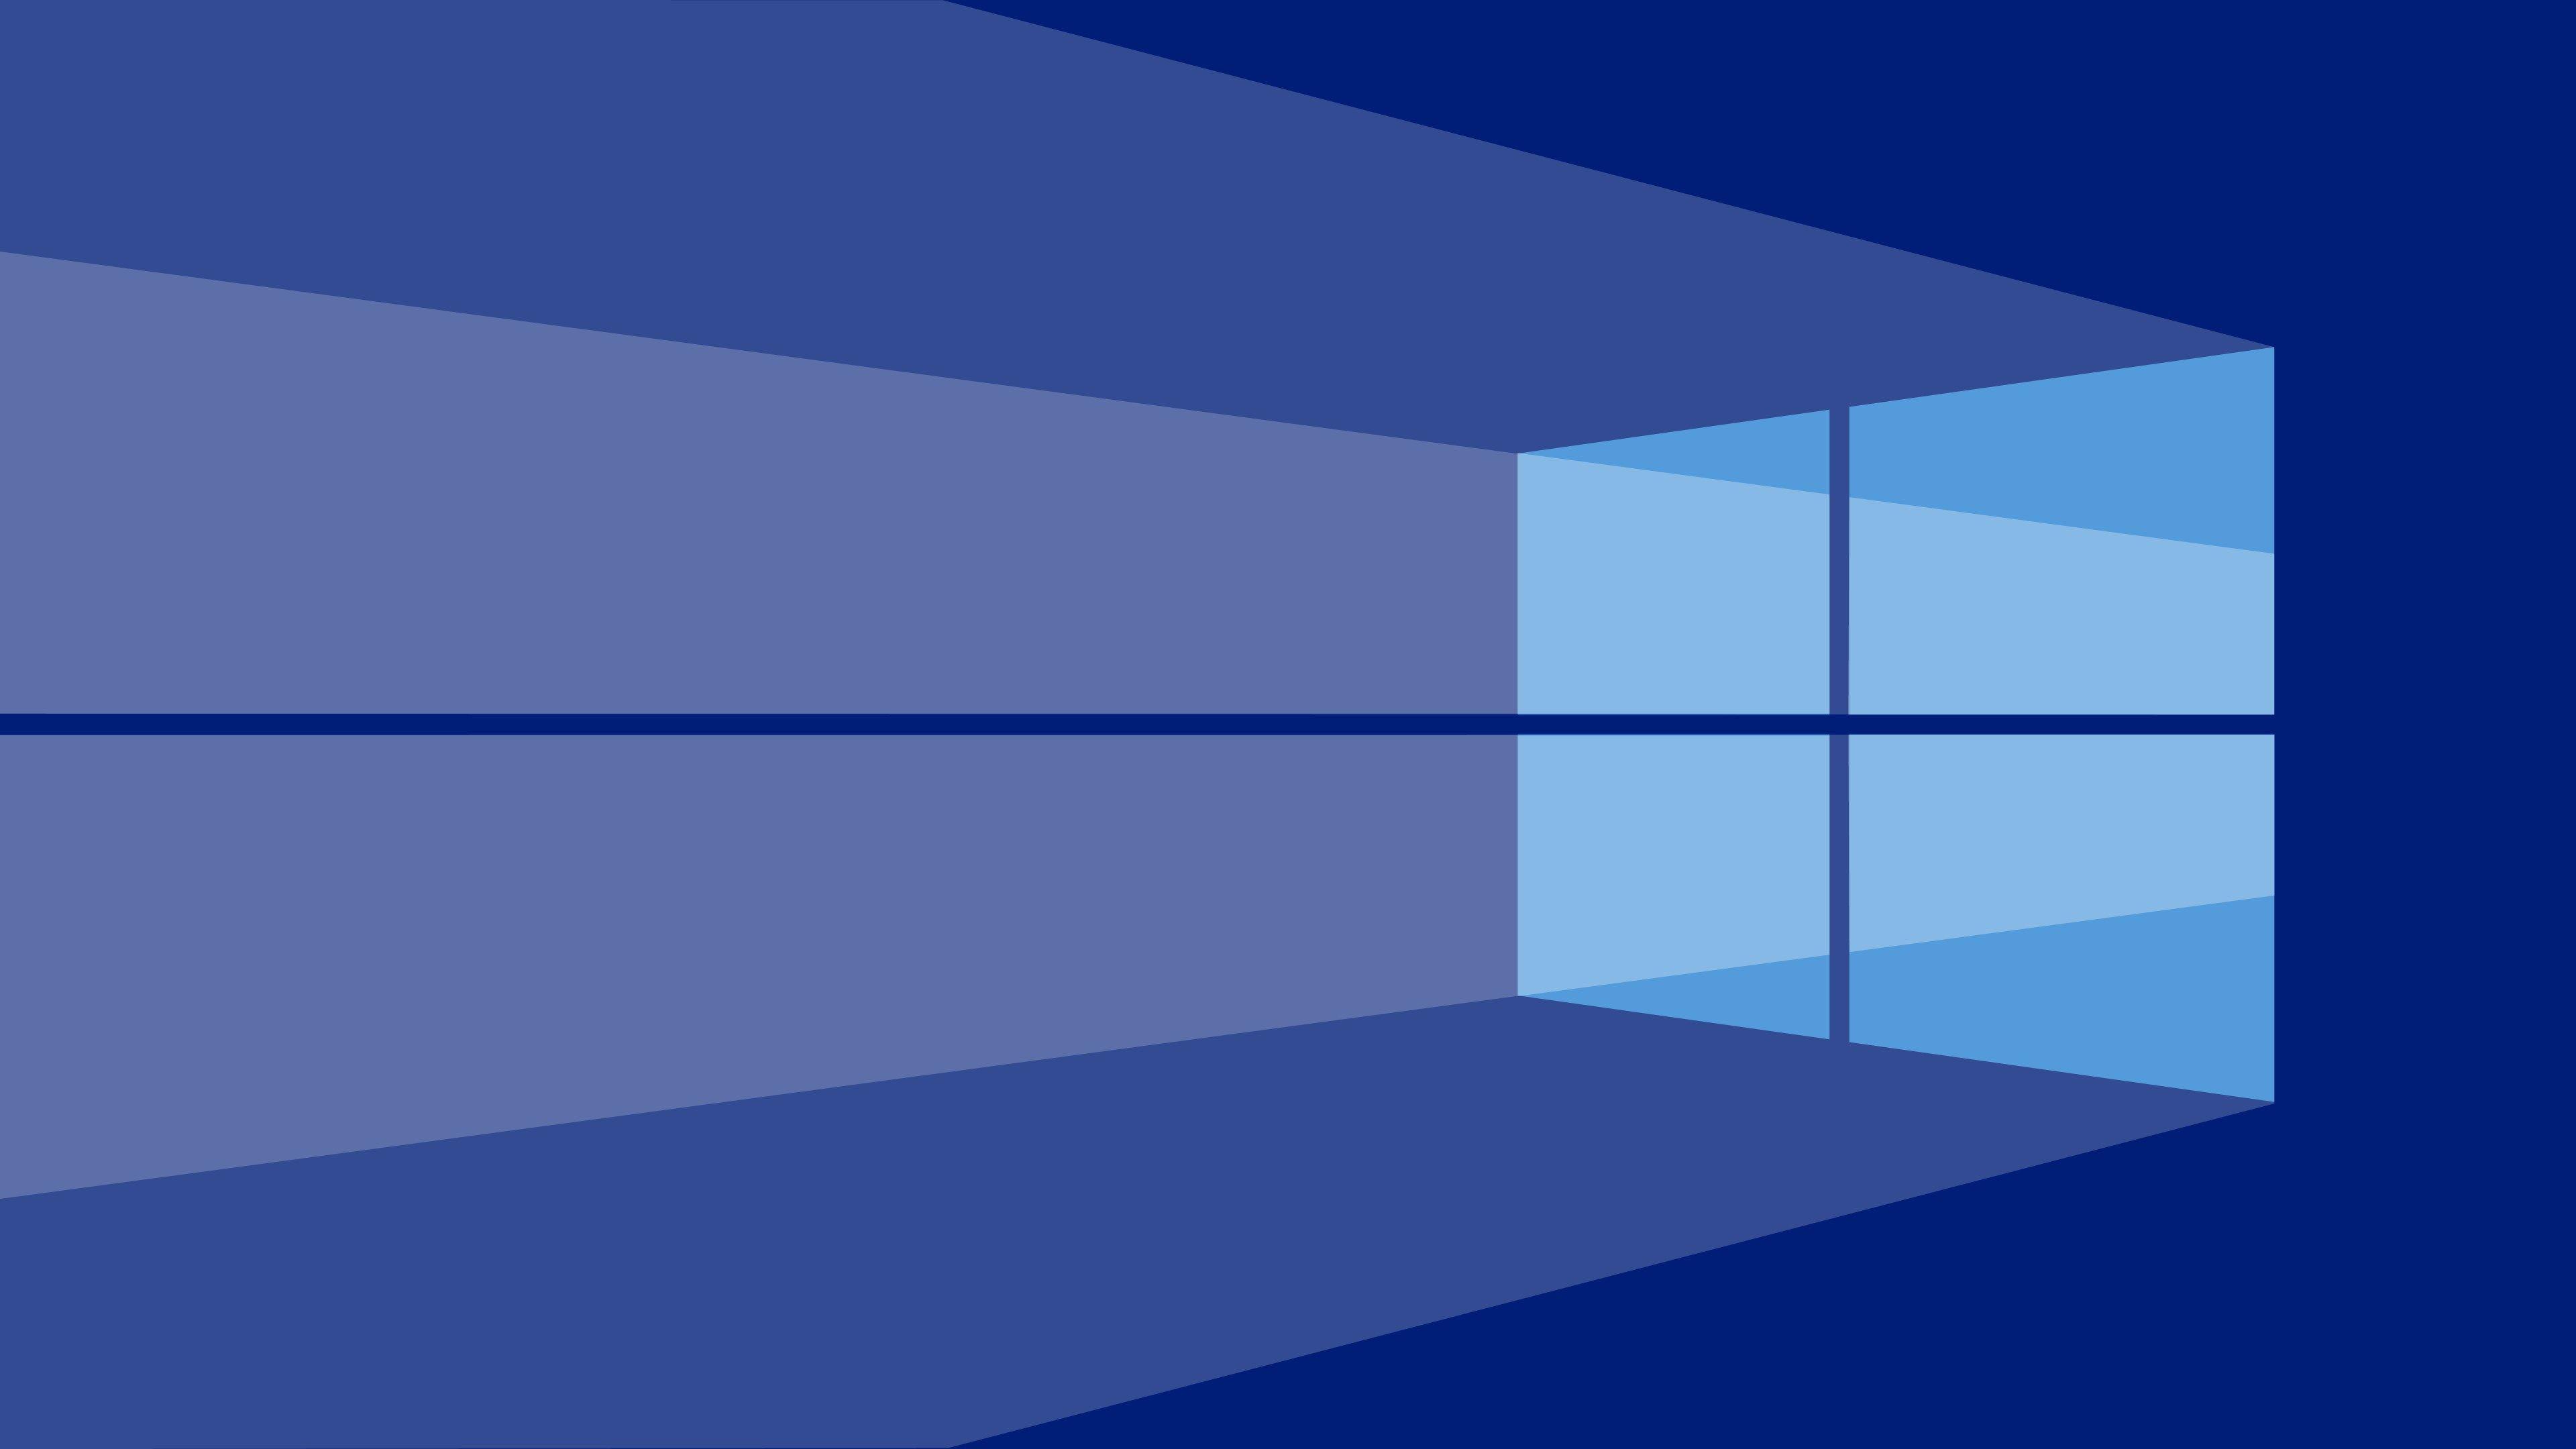 Windows 10 4k Wallpapers - Sfondi Windows 10 4k - HD Wallpaper